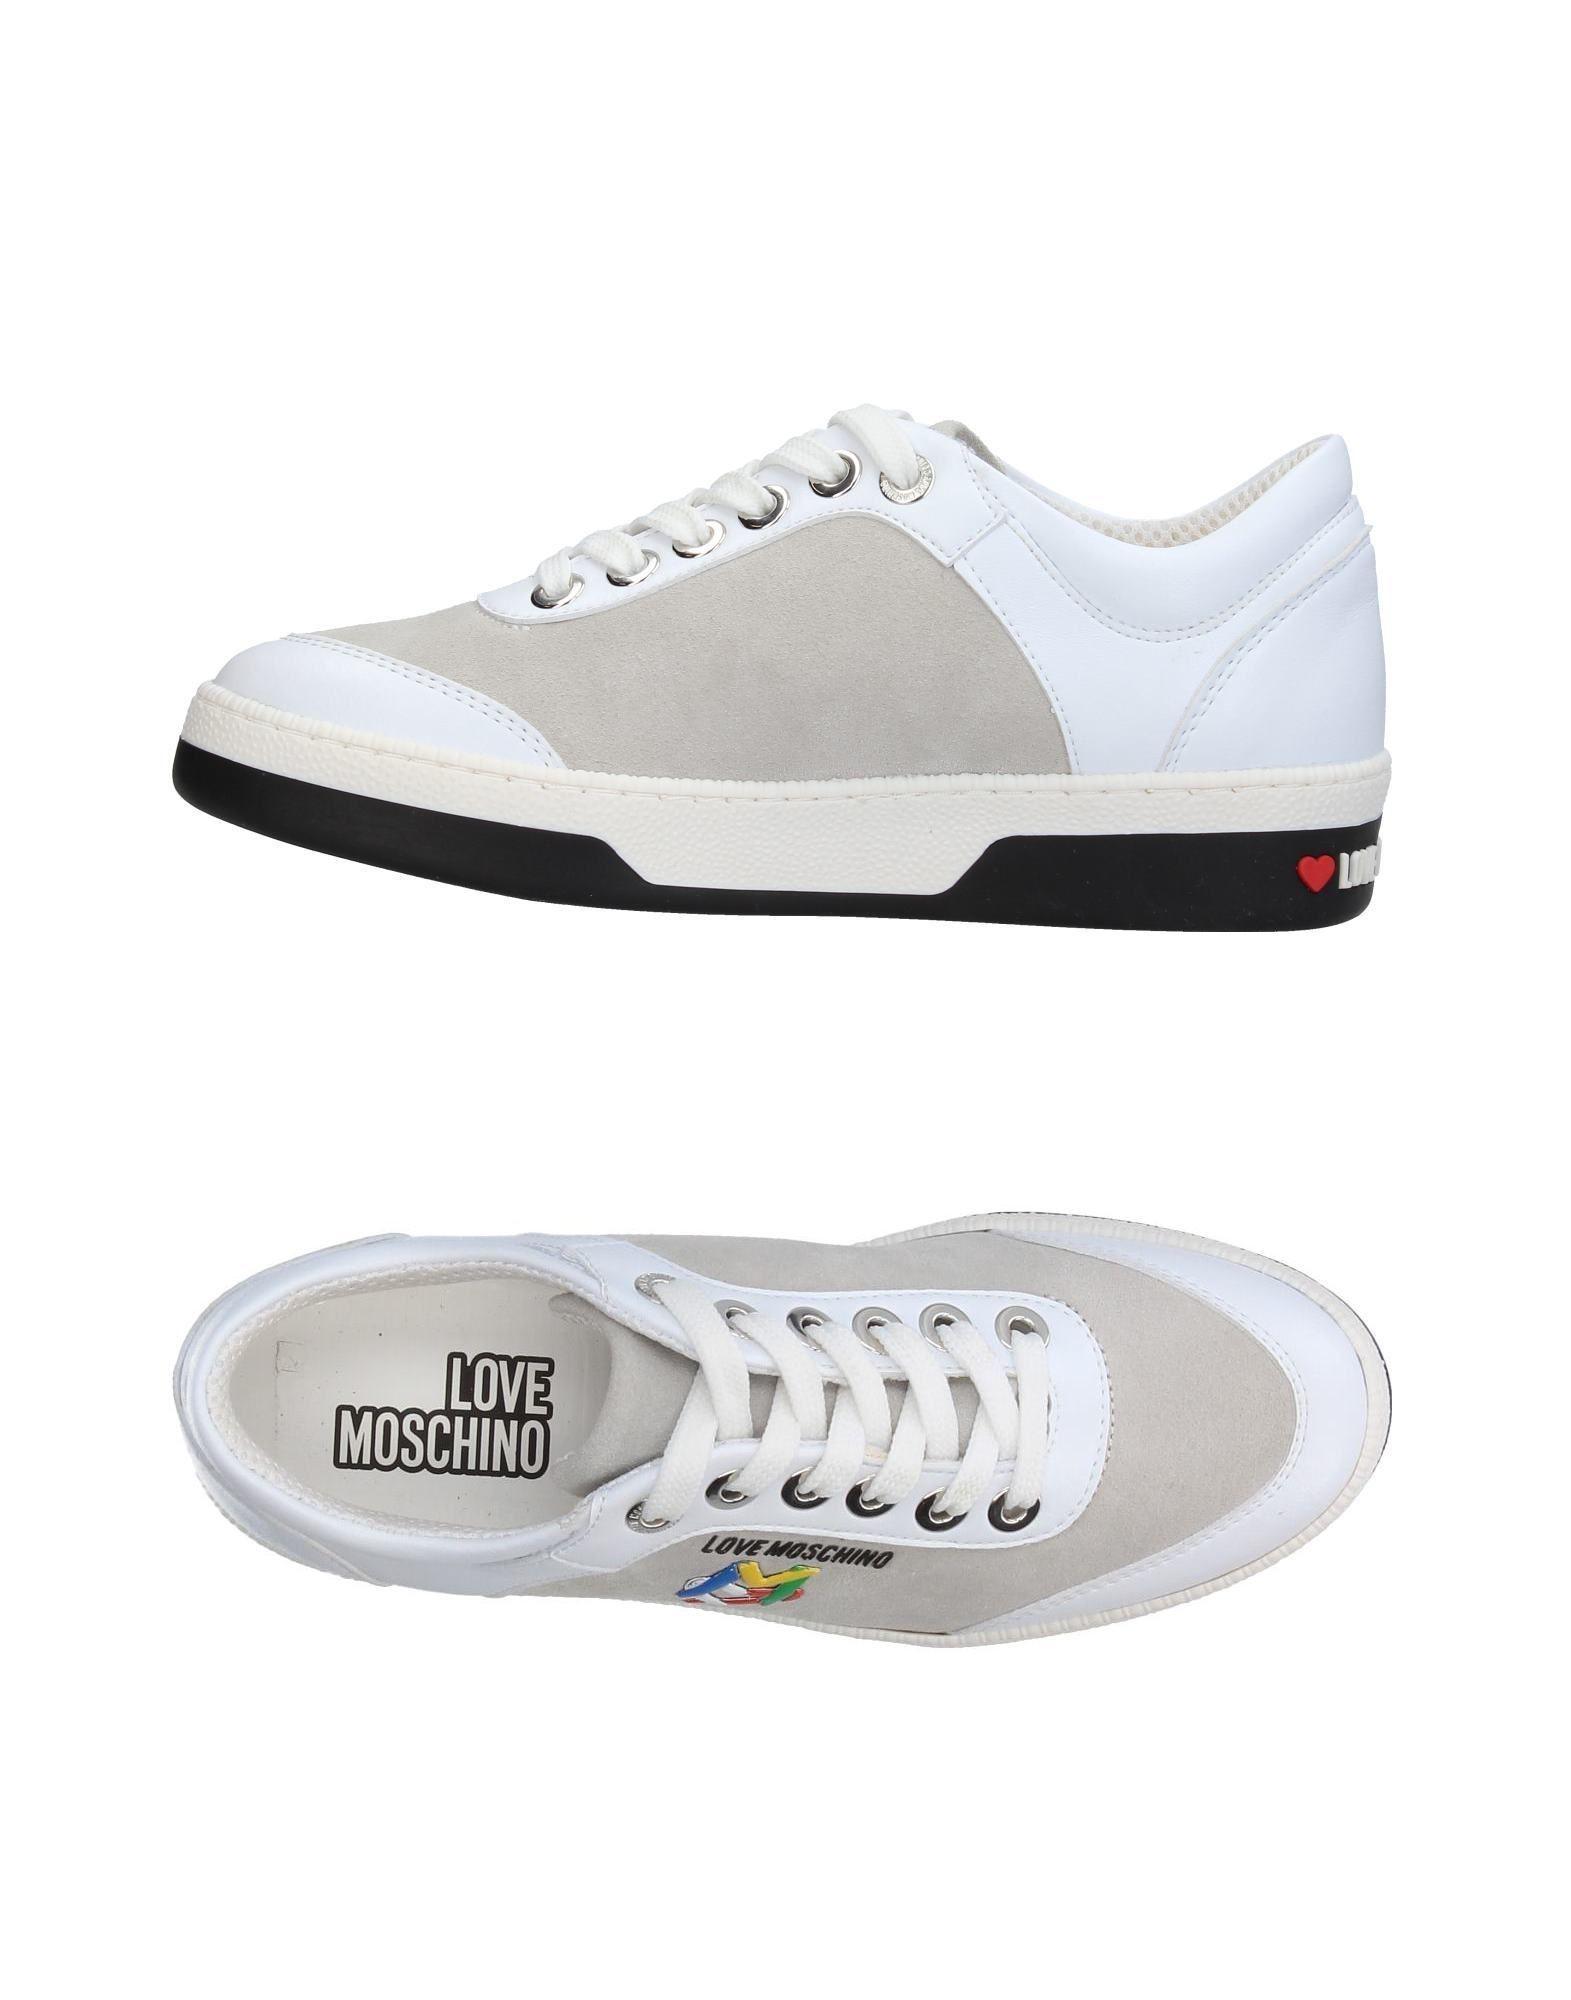 FOOTWEAR - High-tops & sneakers on YOOX.COM Love Moschino uZPVJ5ND6